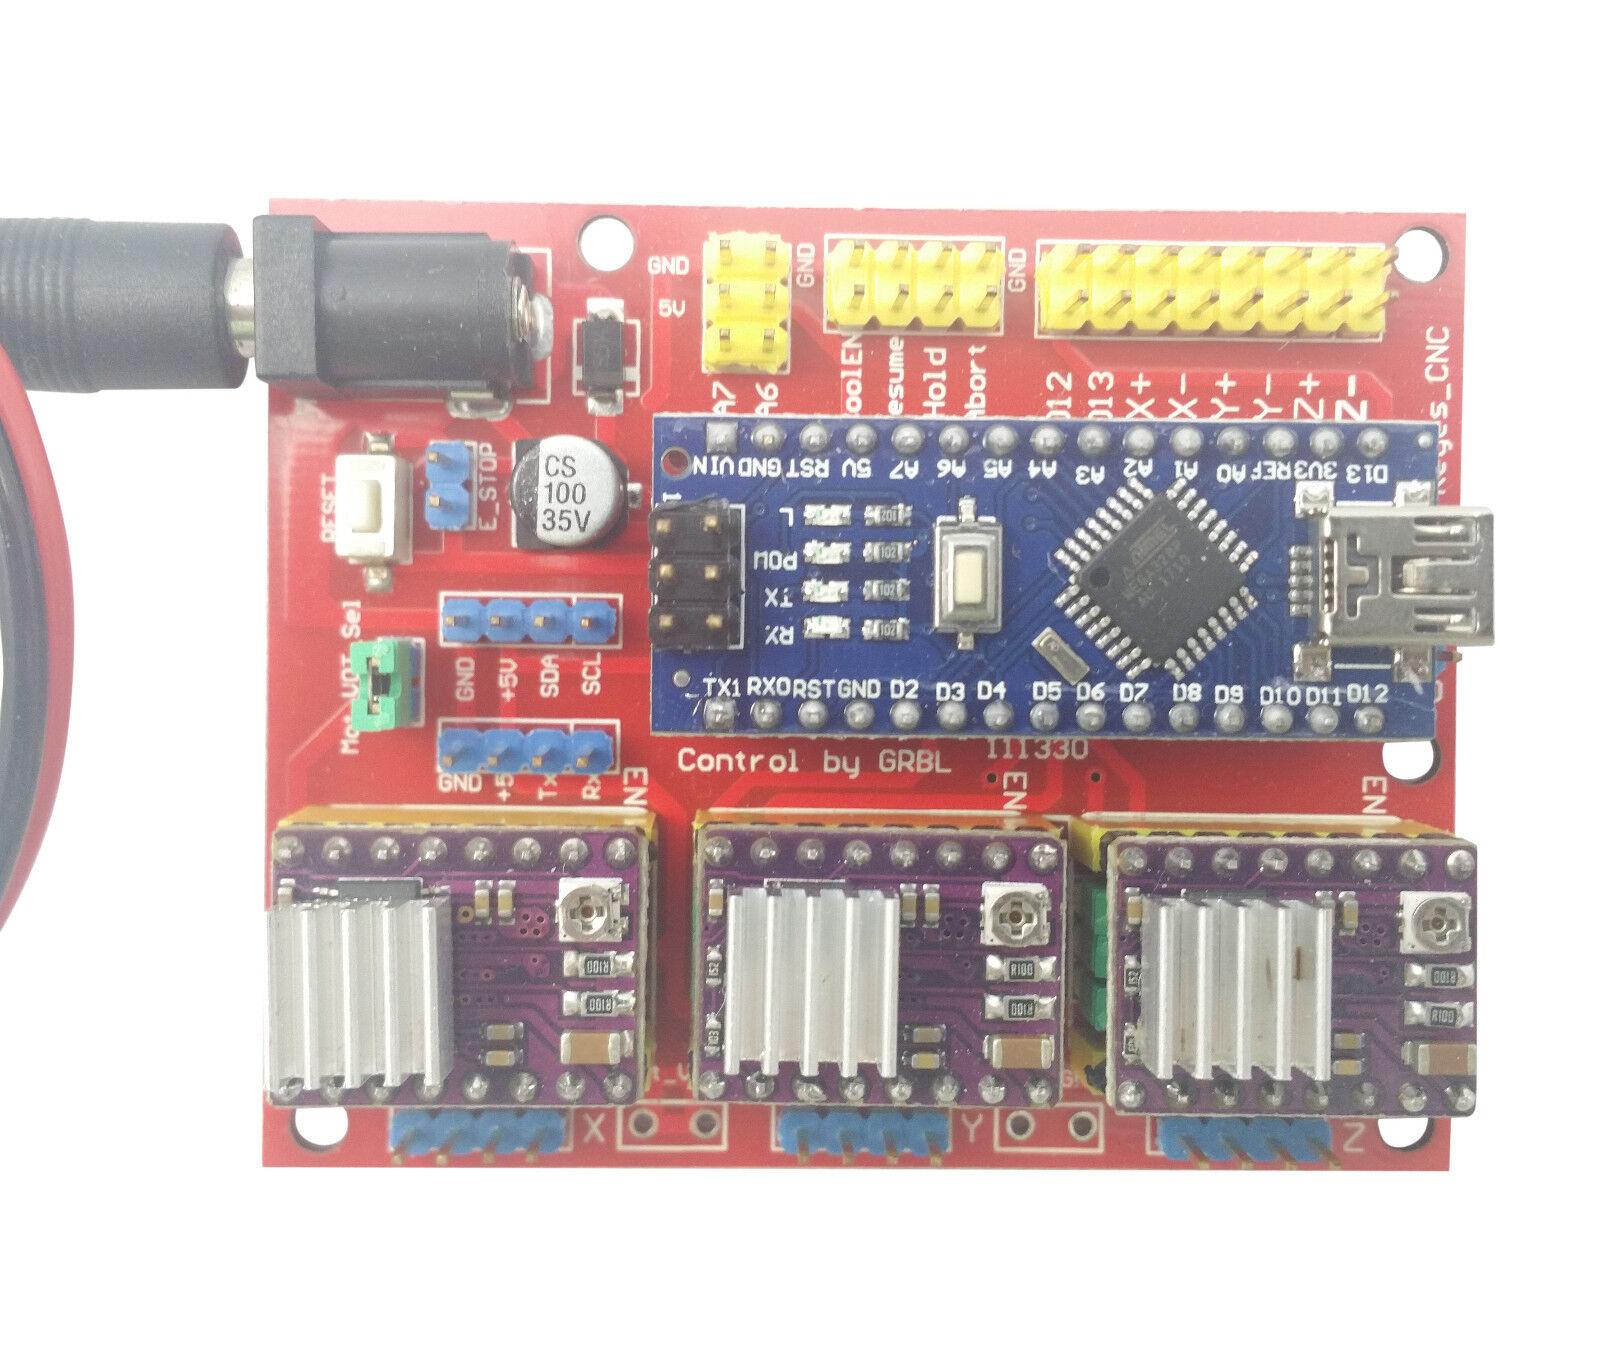 hight resolution of arduino nano cnc shield drv8825 board package kit w 3x optical limit switch